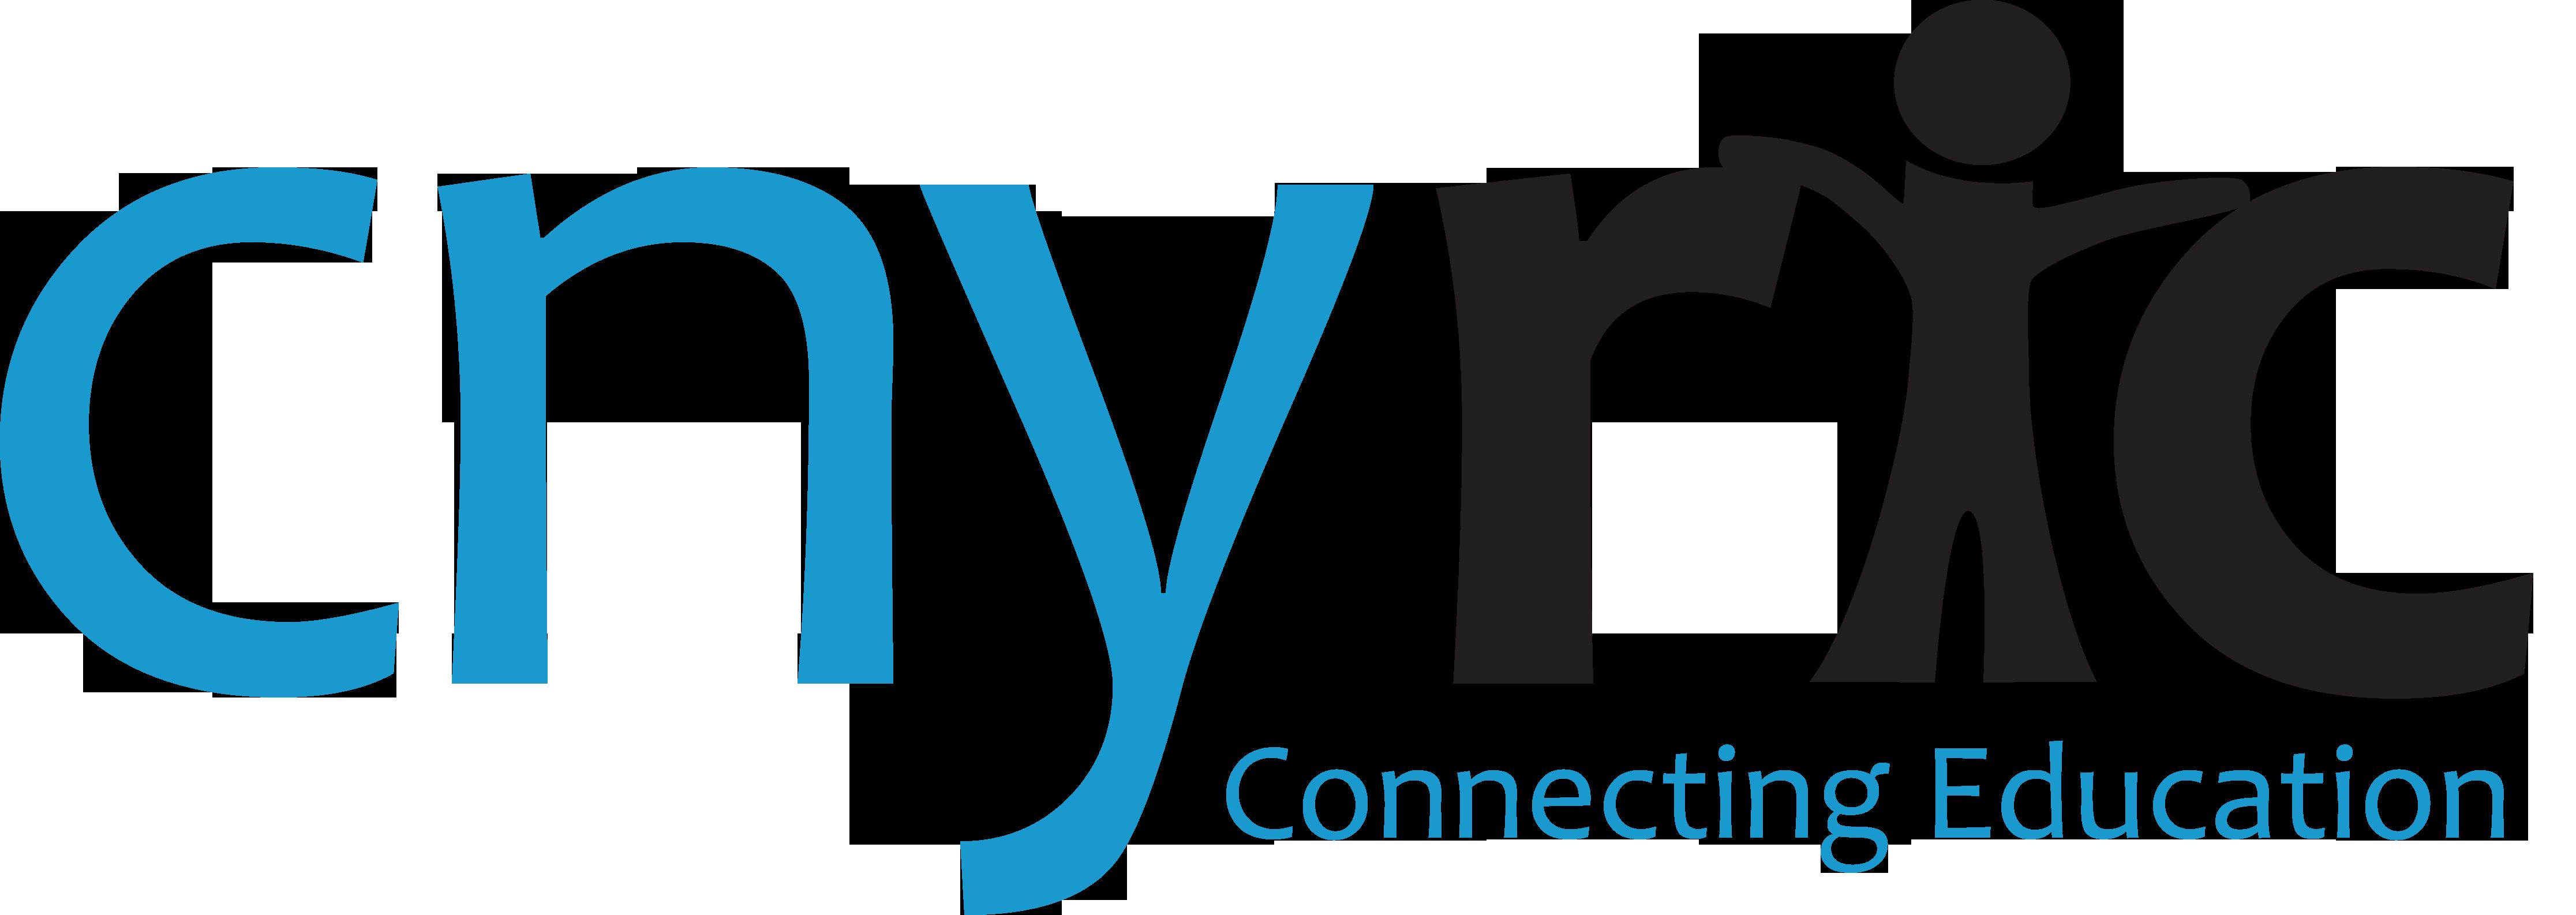 cnyric-logo-FINAL